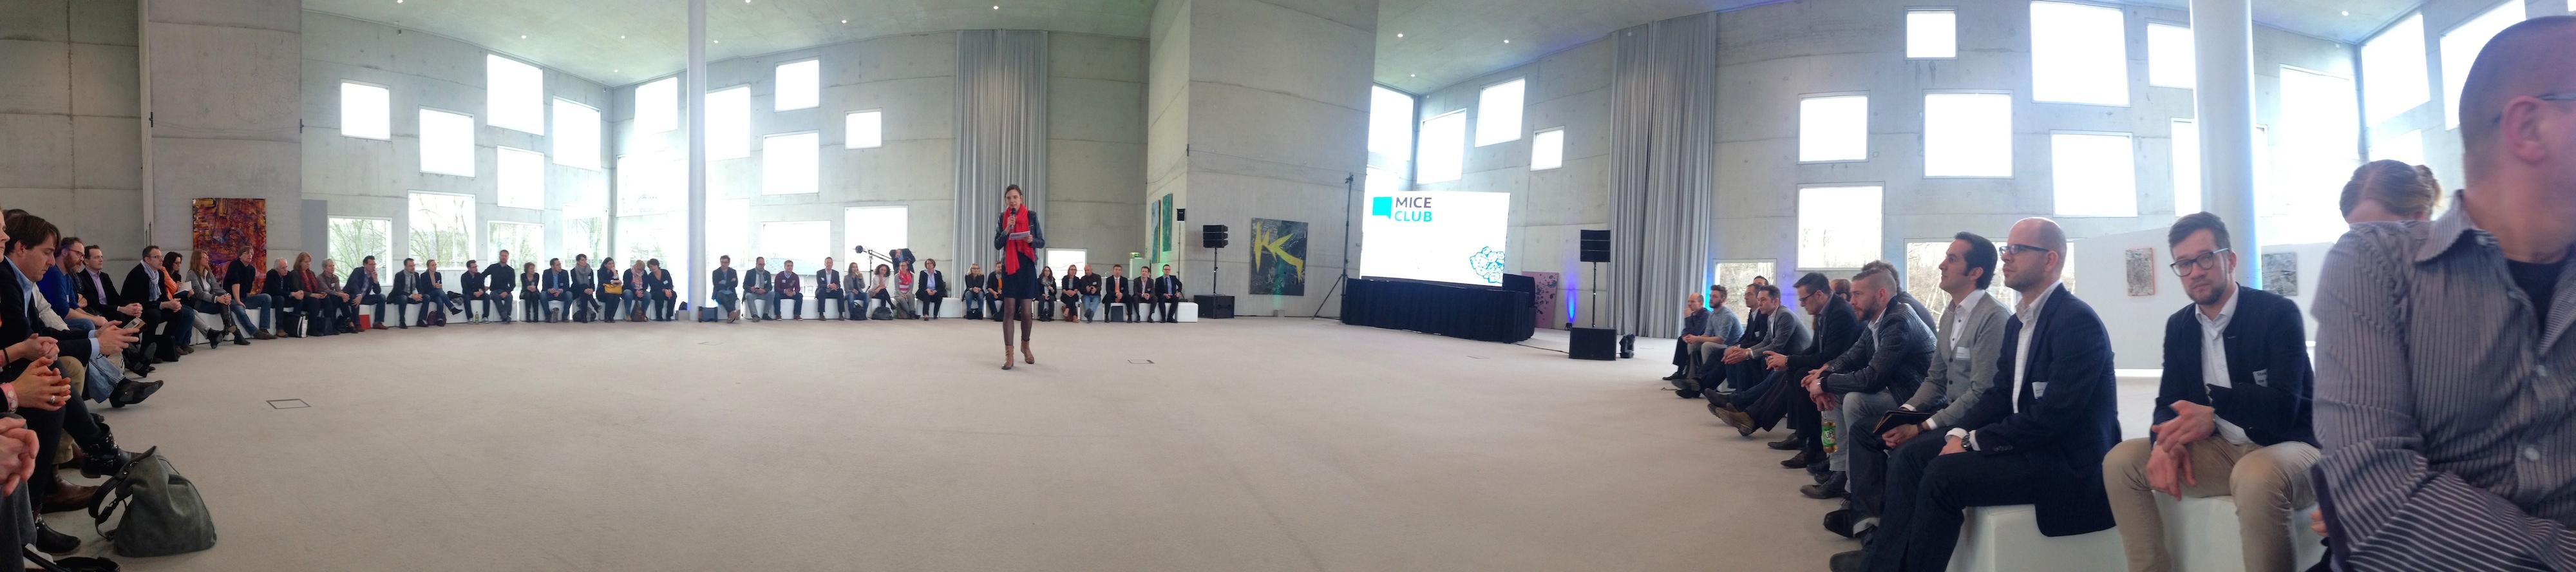 Interaktive Plenumssession MICE Club Live 2015